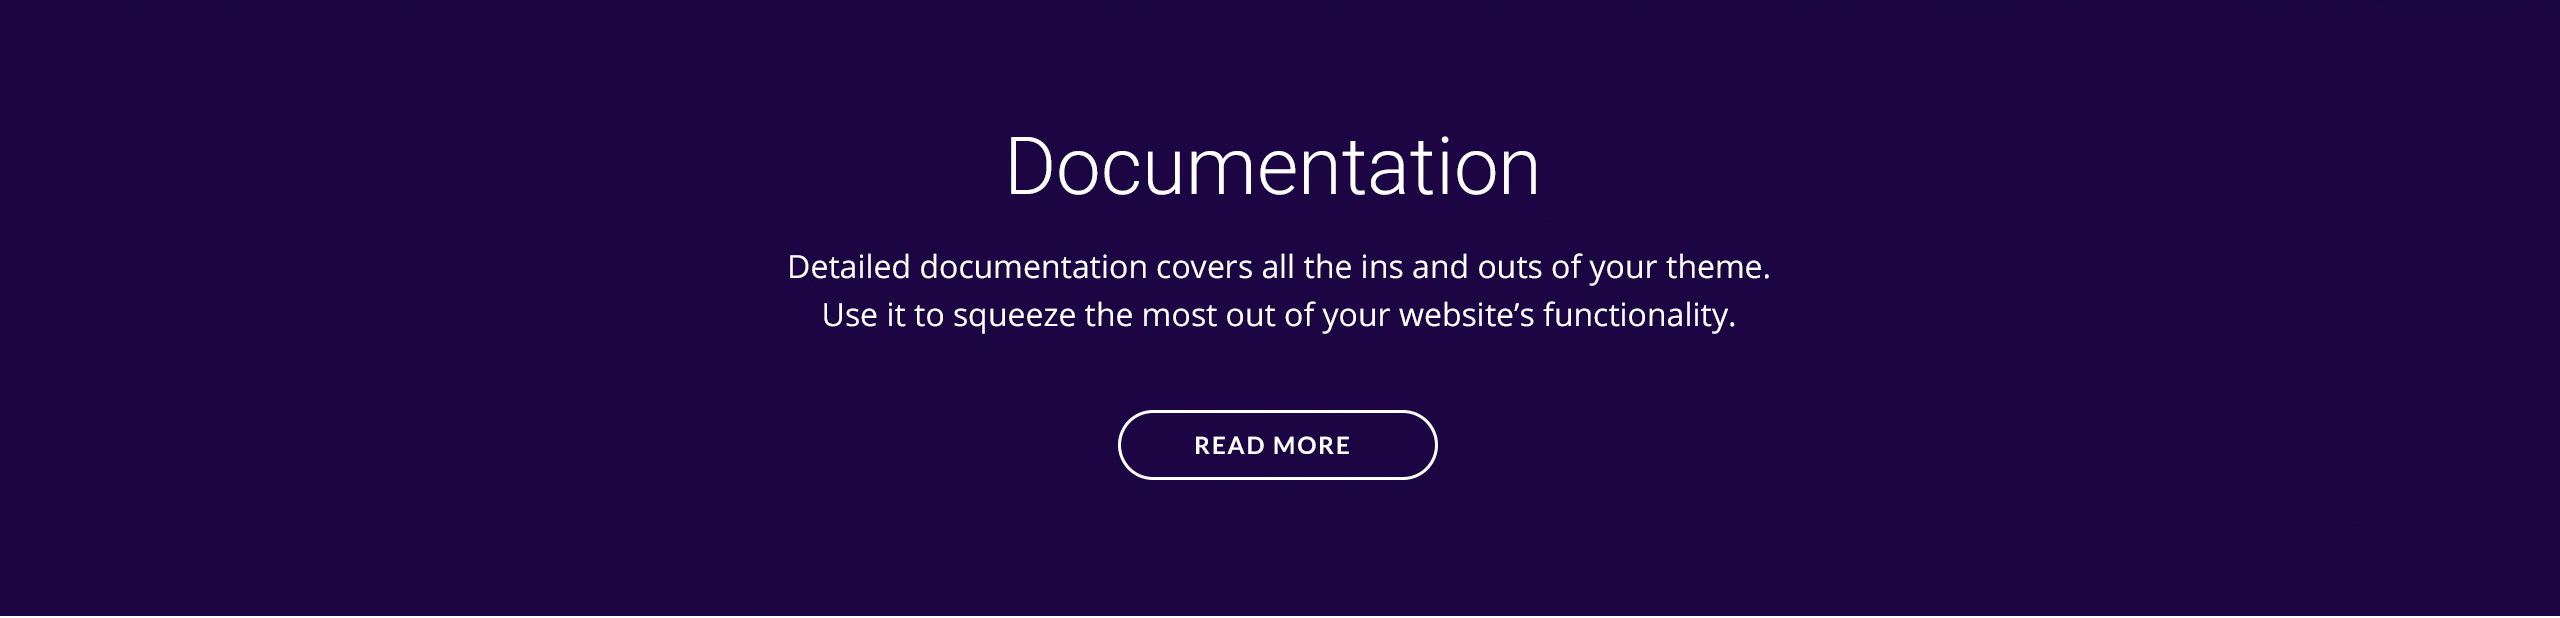 .Bank Website Template